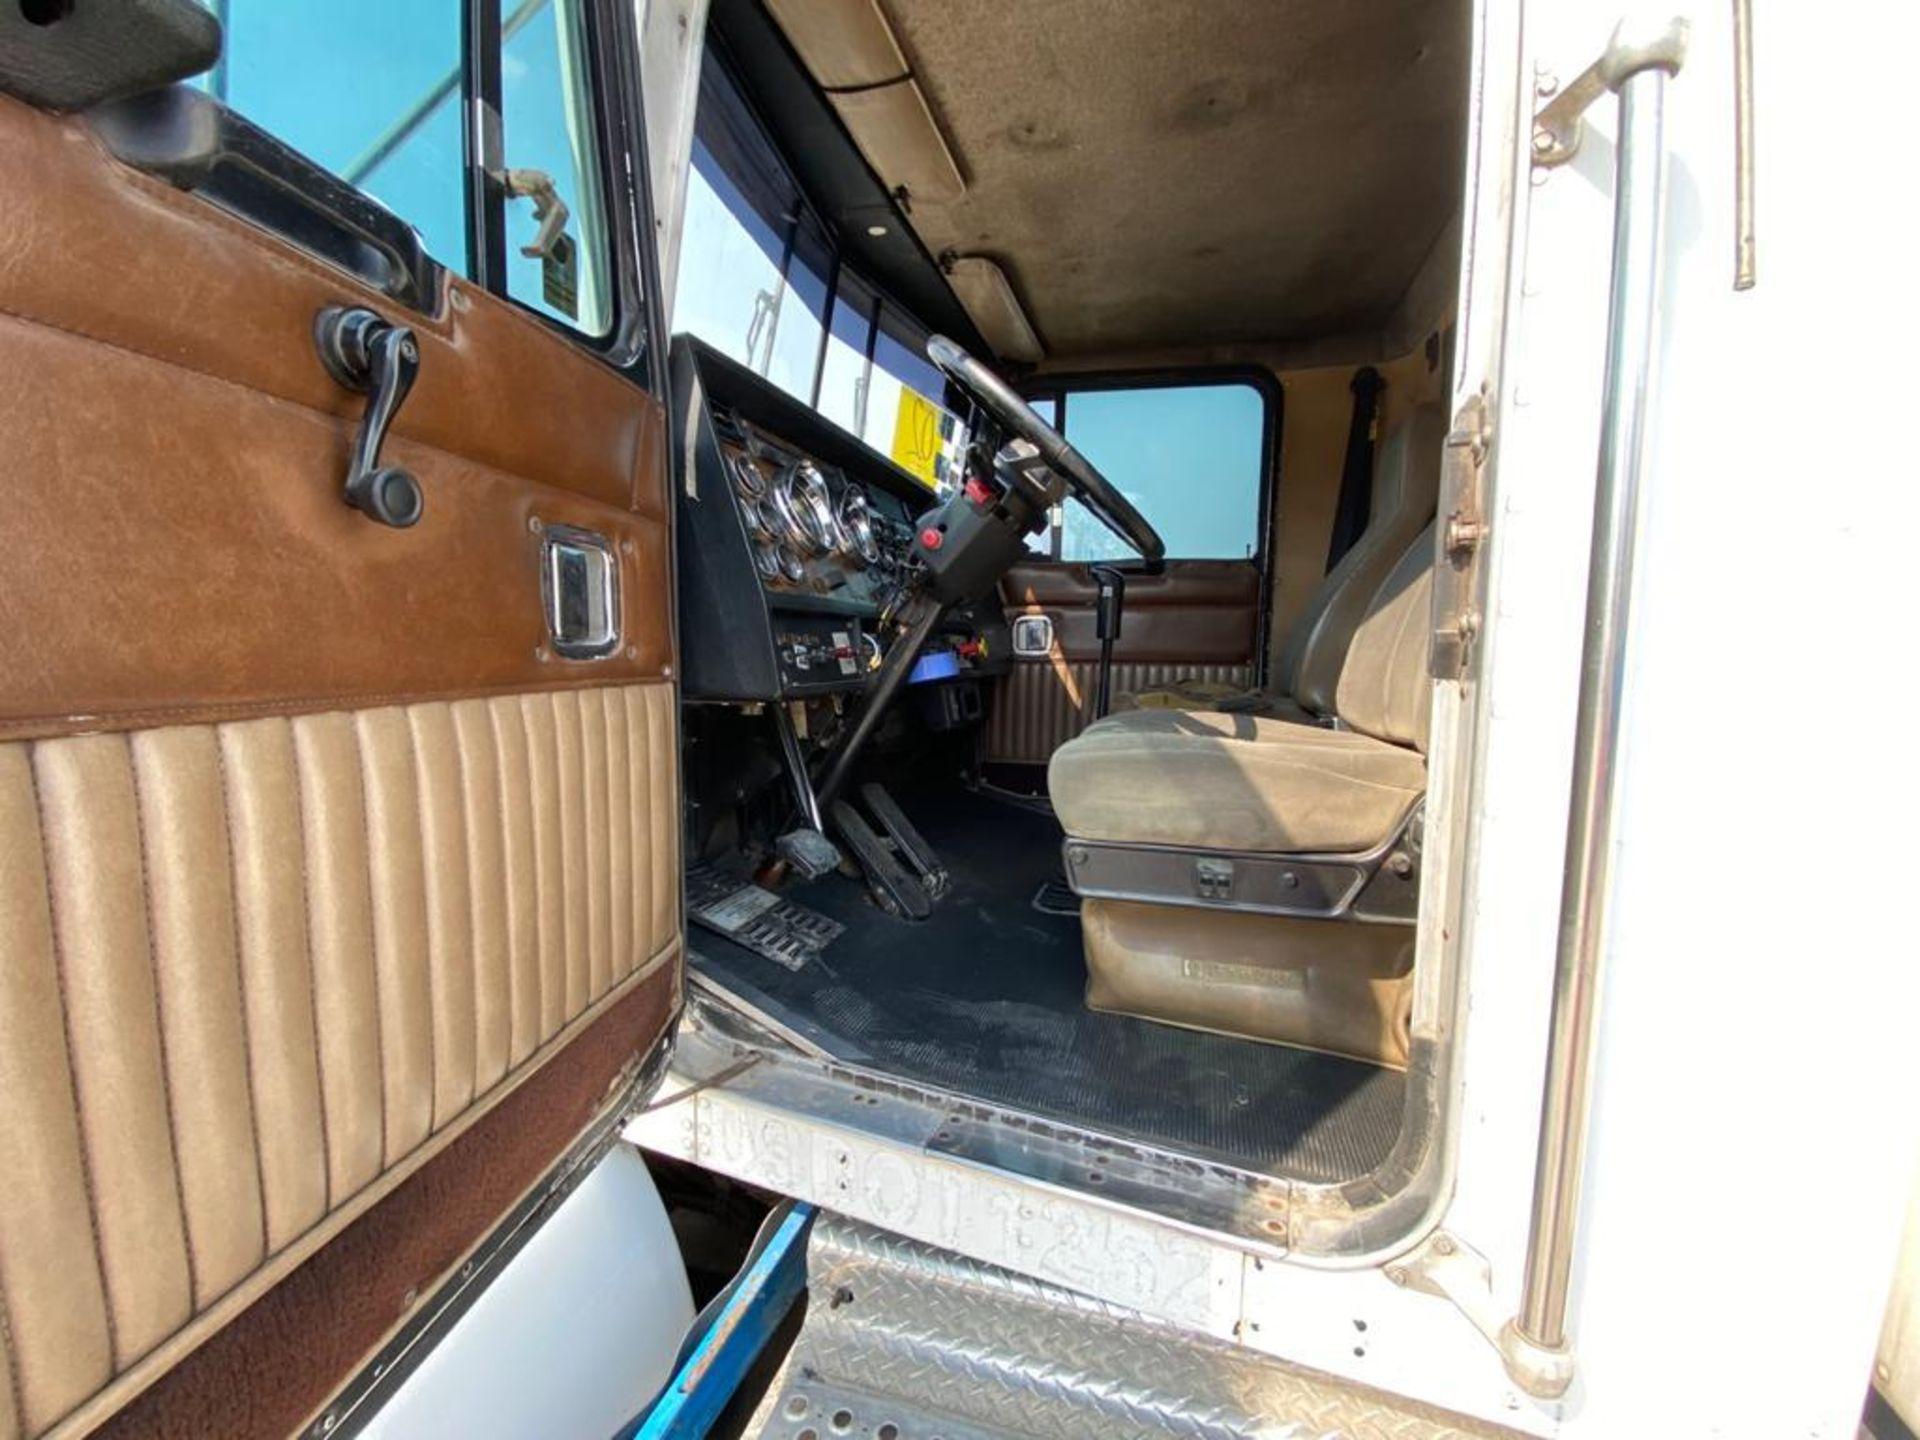 1999 Kenworth Sleeper truck tractor, standard transmission of 18 speeds - Image 31 of 75